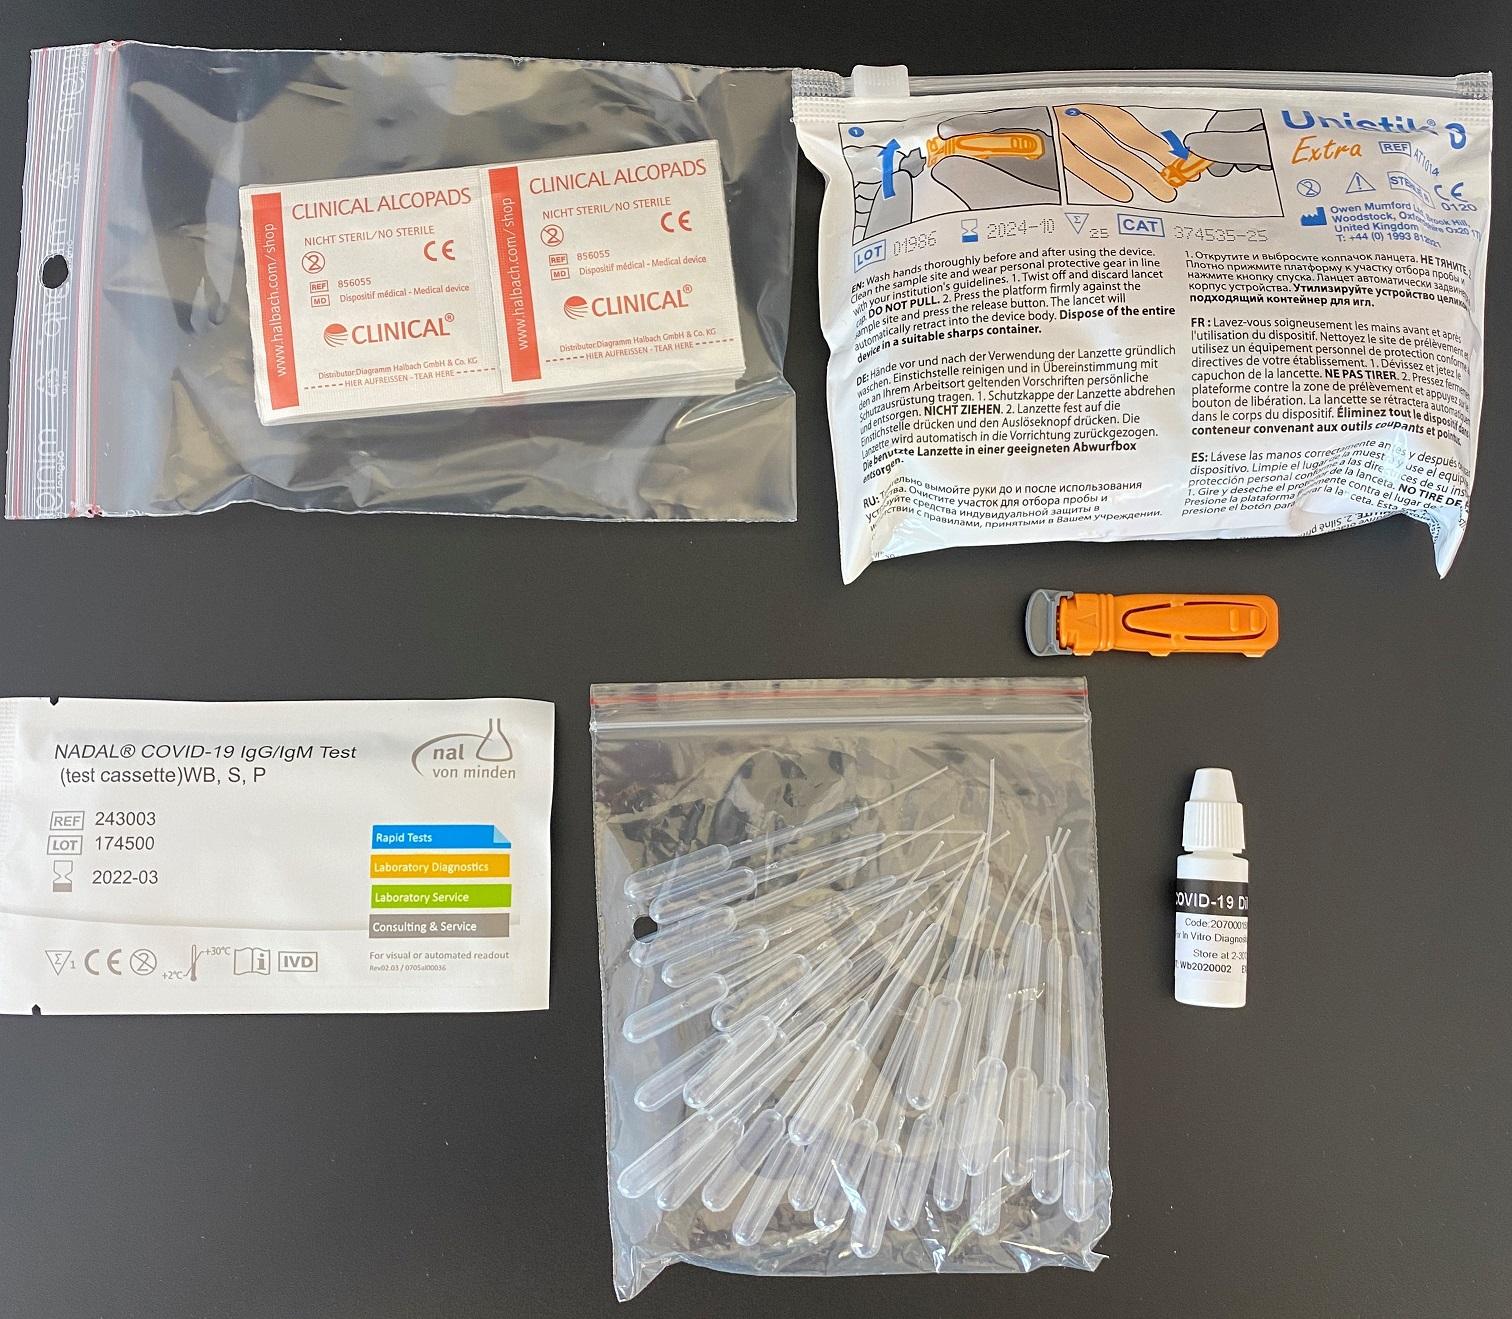 Nadal Covid-19 IgG/IgM Antikörper Schnelltest